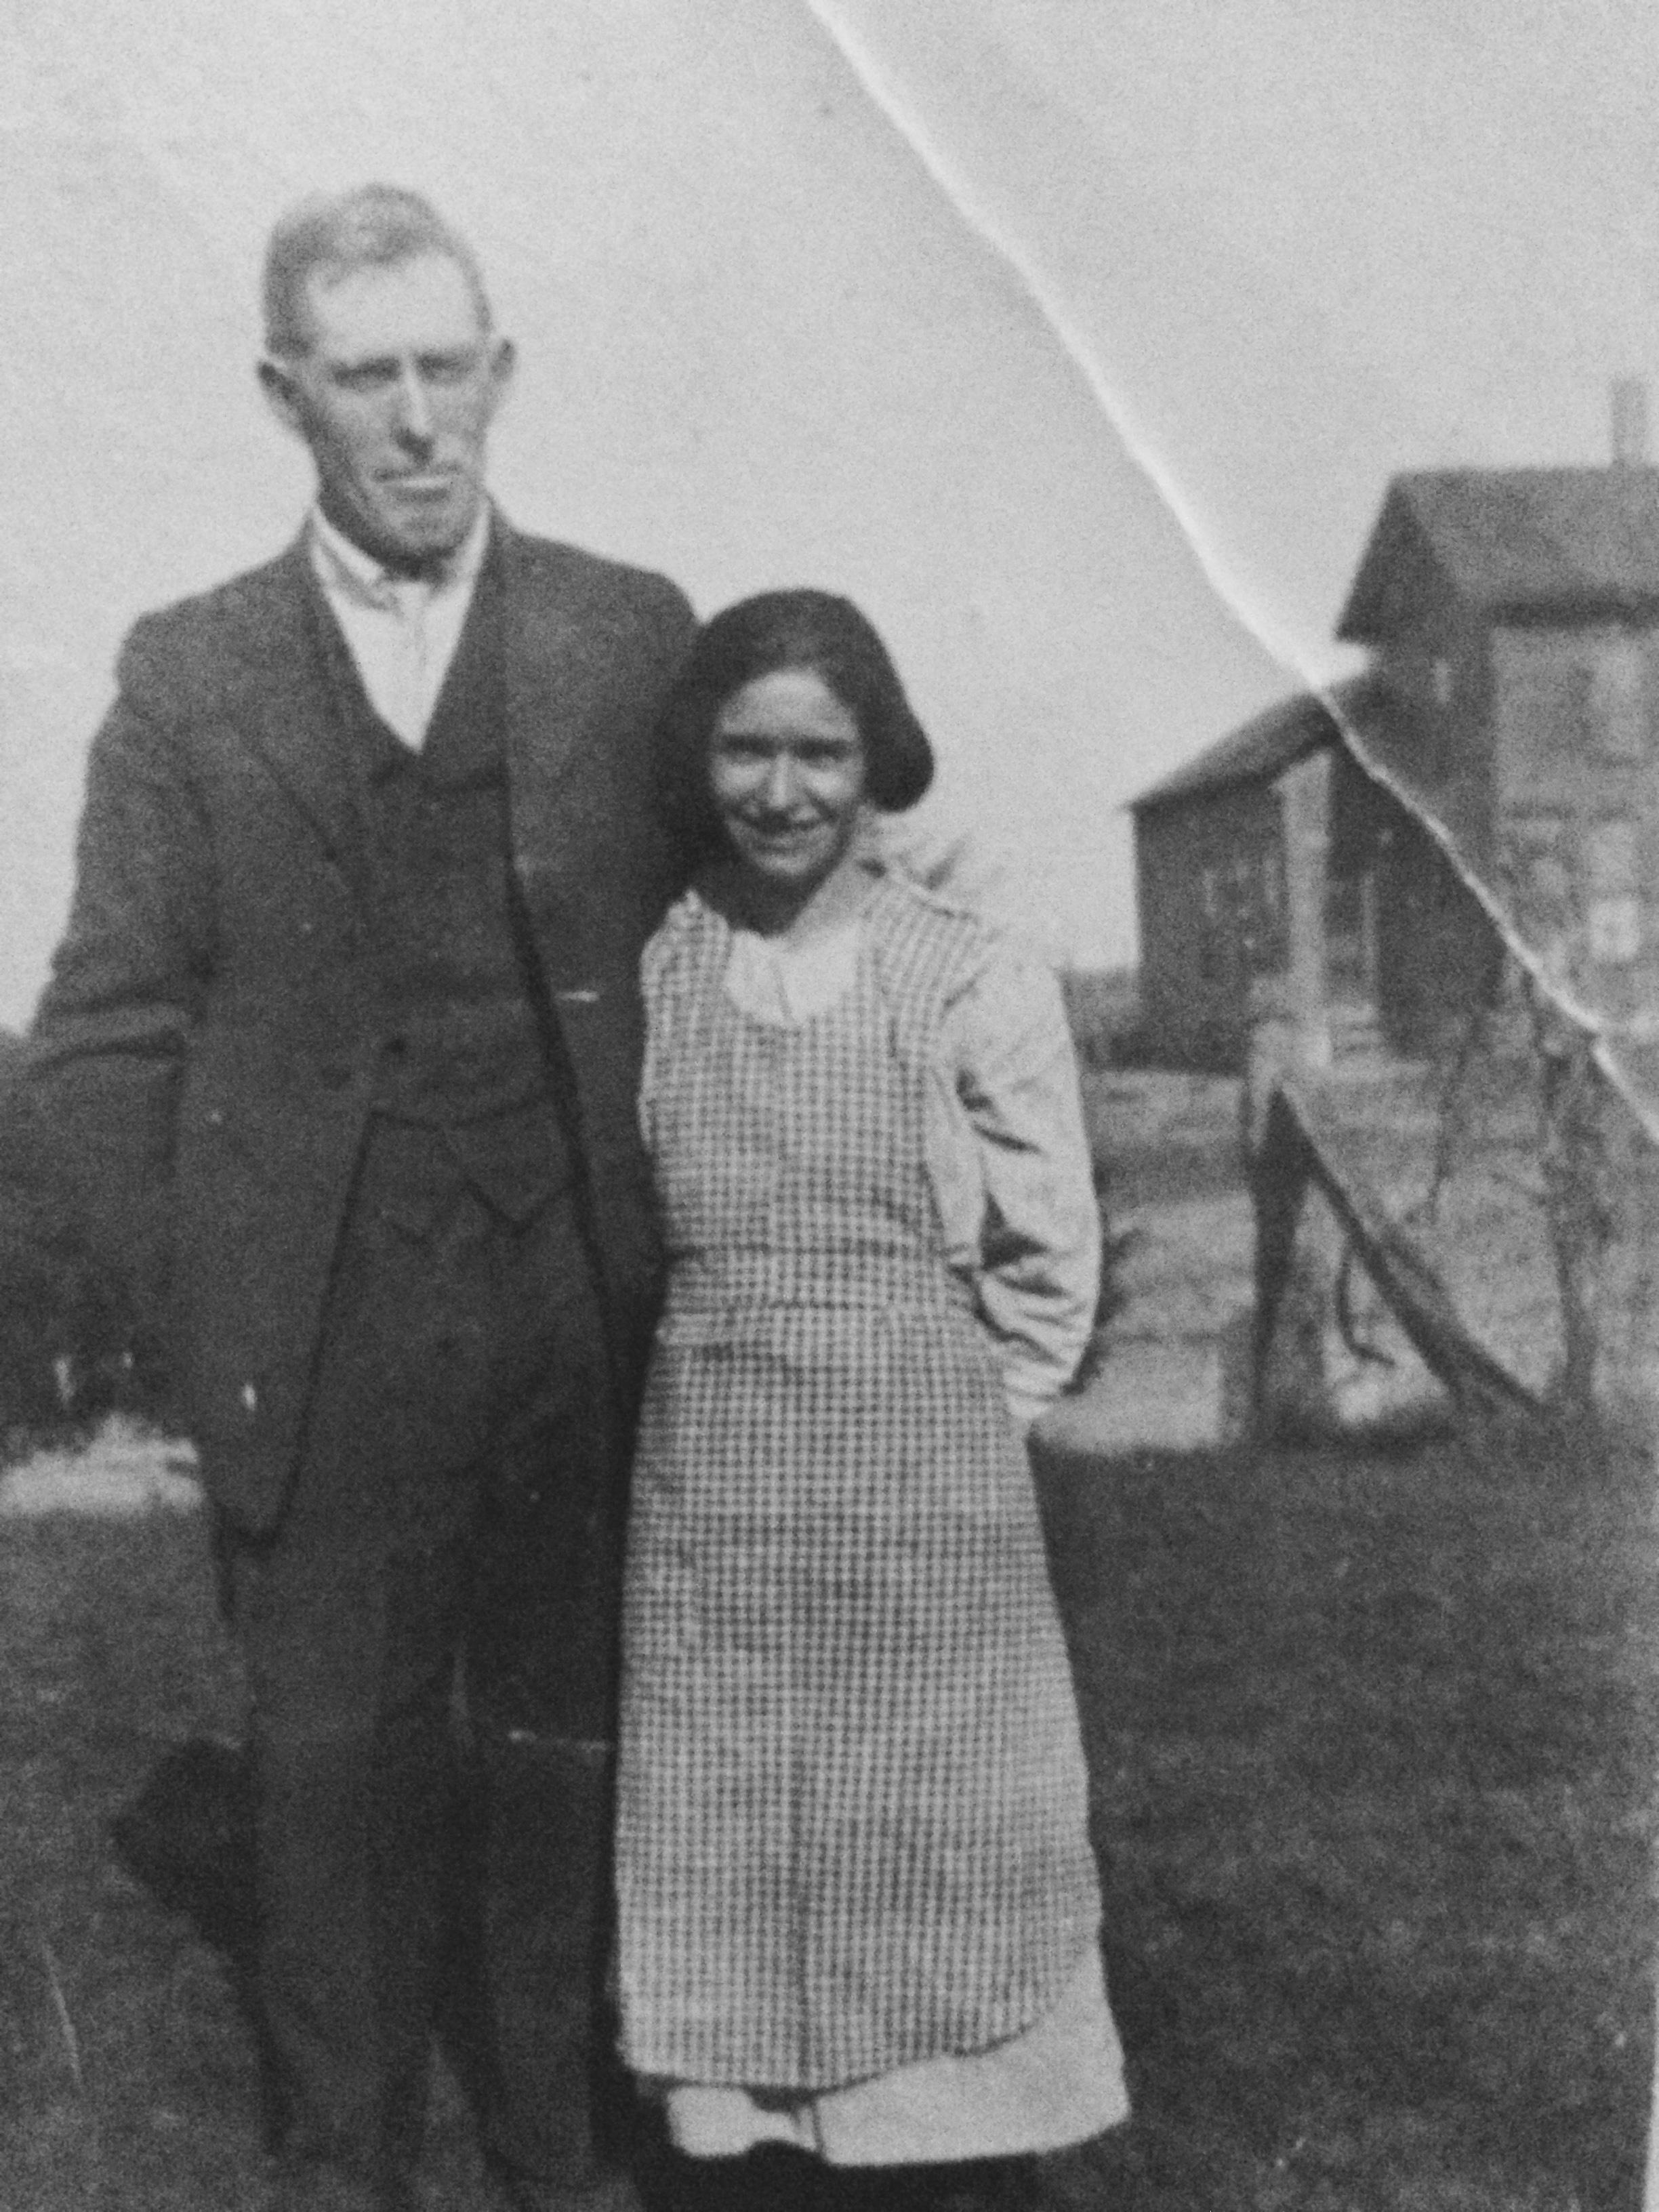 Bessie May Shuster Lent and John Lent